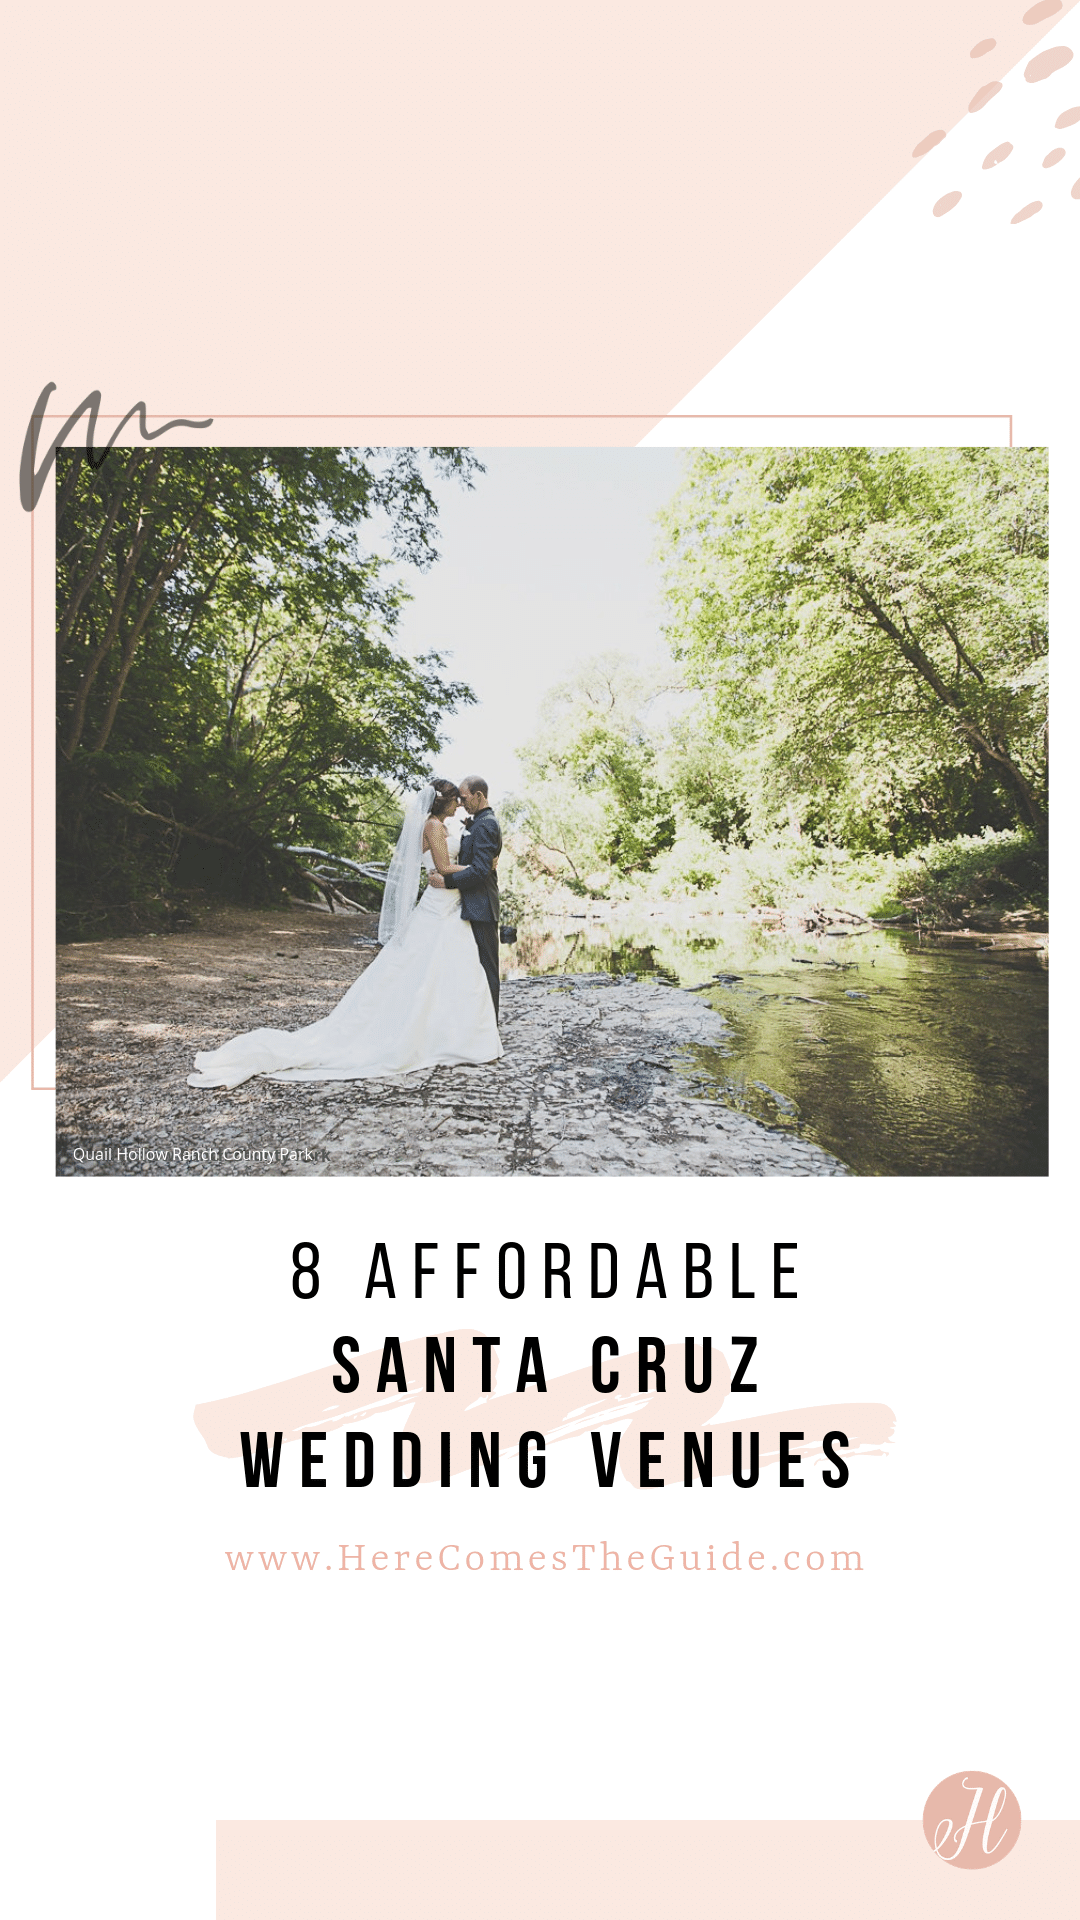 7 Affordable Santa Cruz Wedding Venues See Prices California Northern California Wedding Venues Wedding Venues Bay Area Wedding Venues